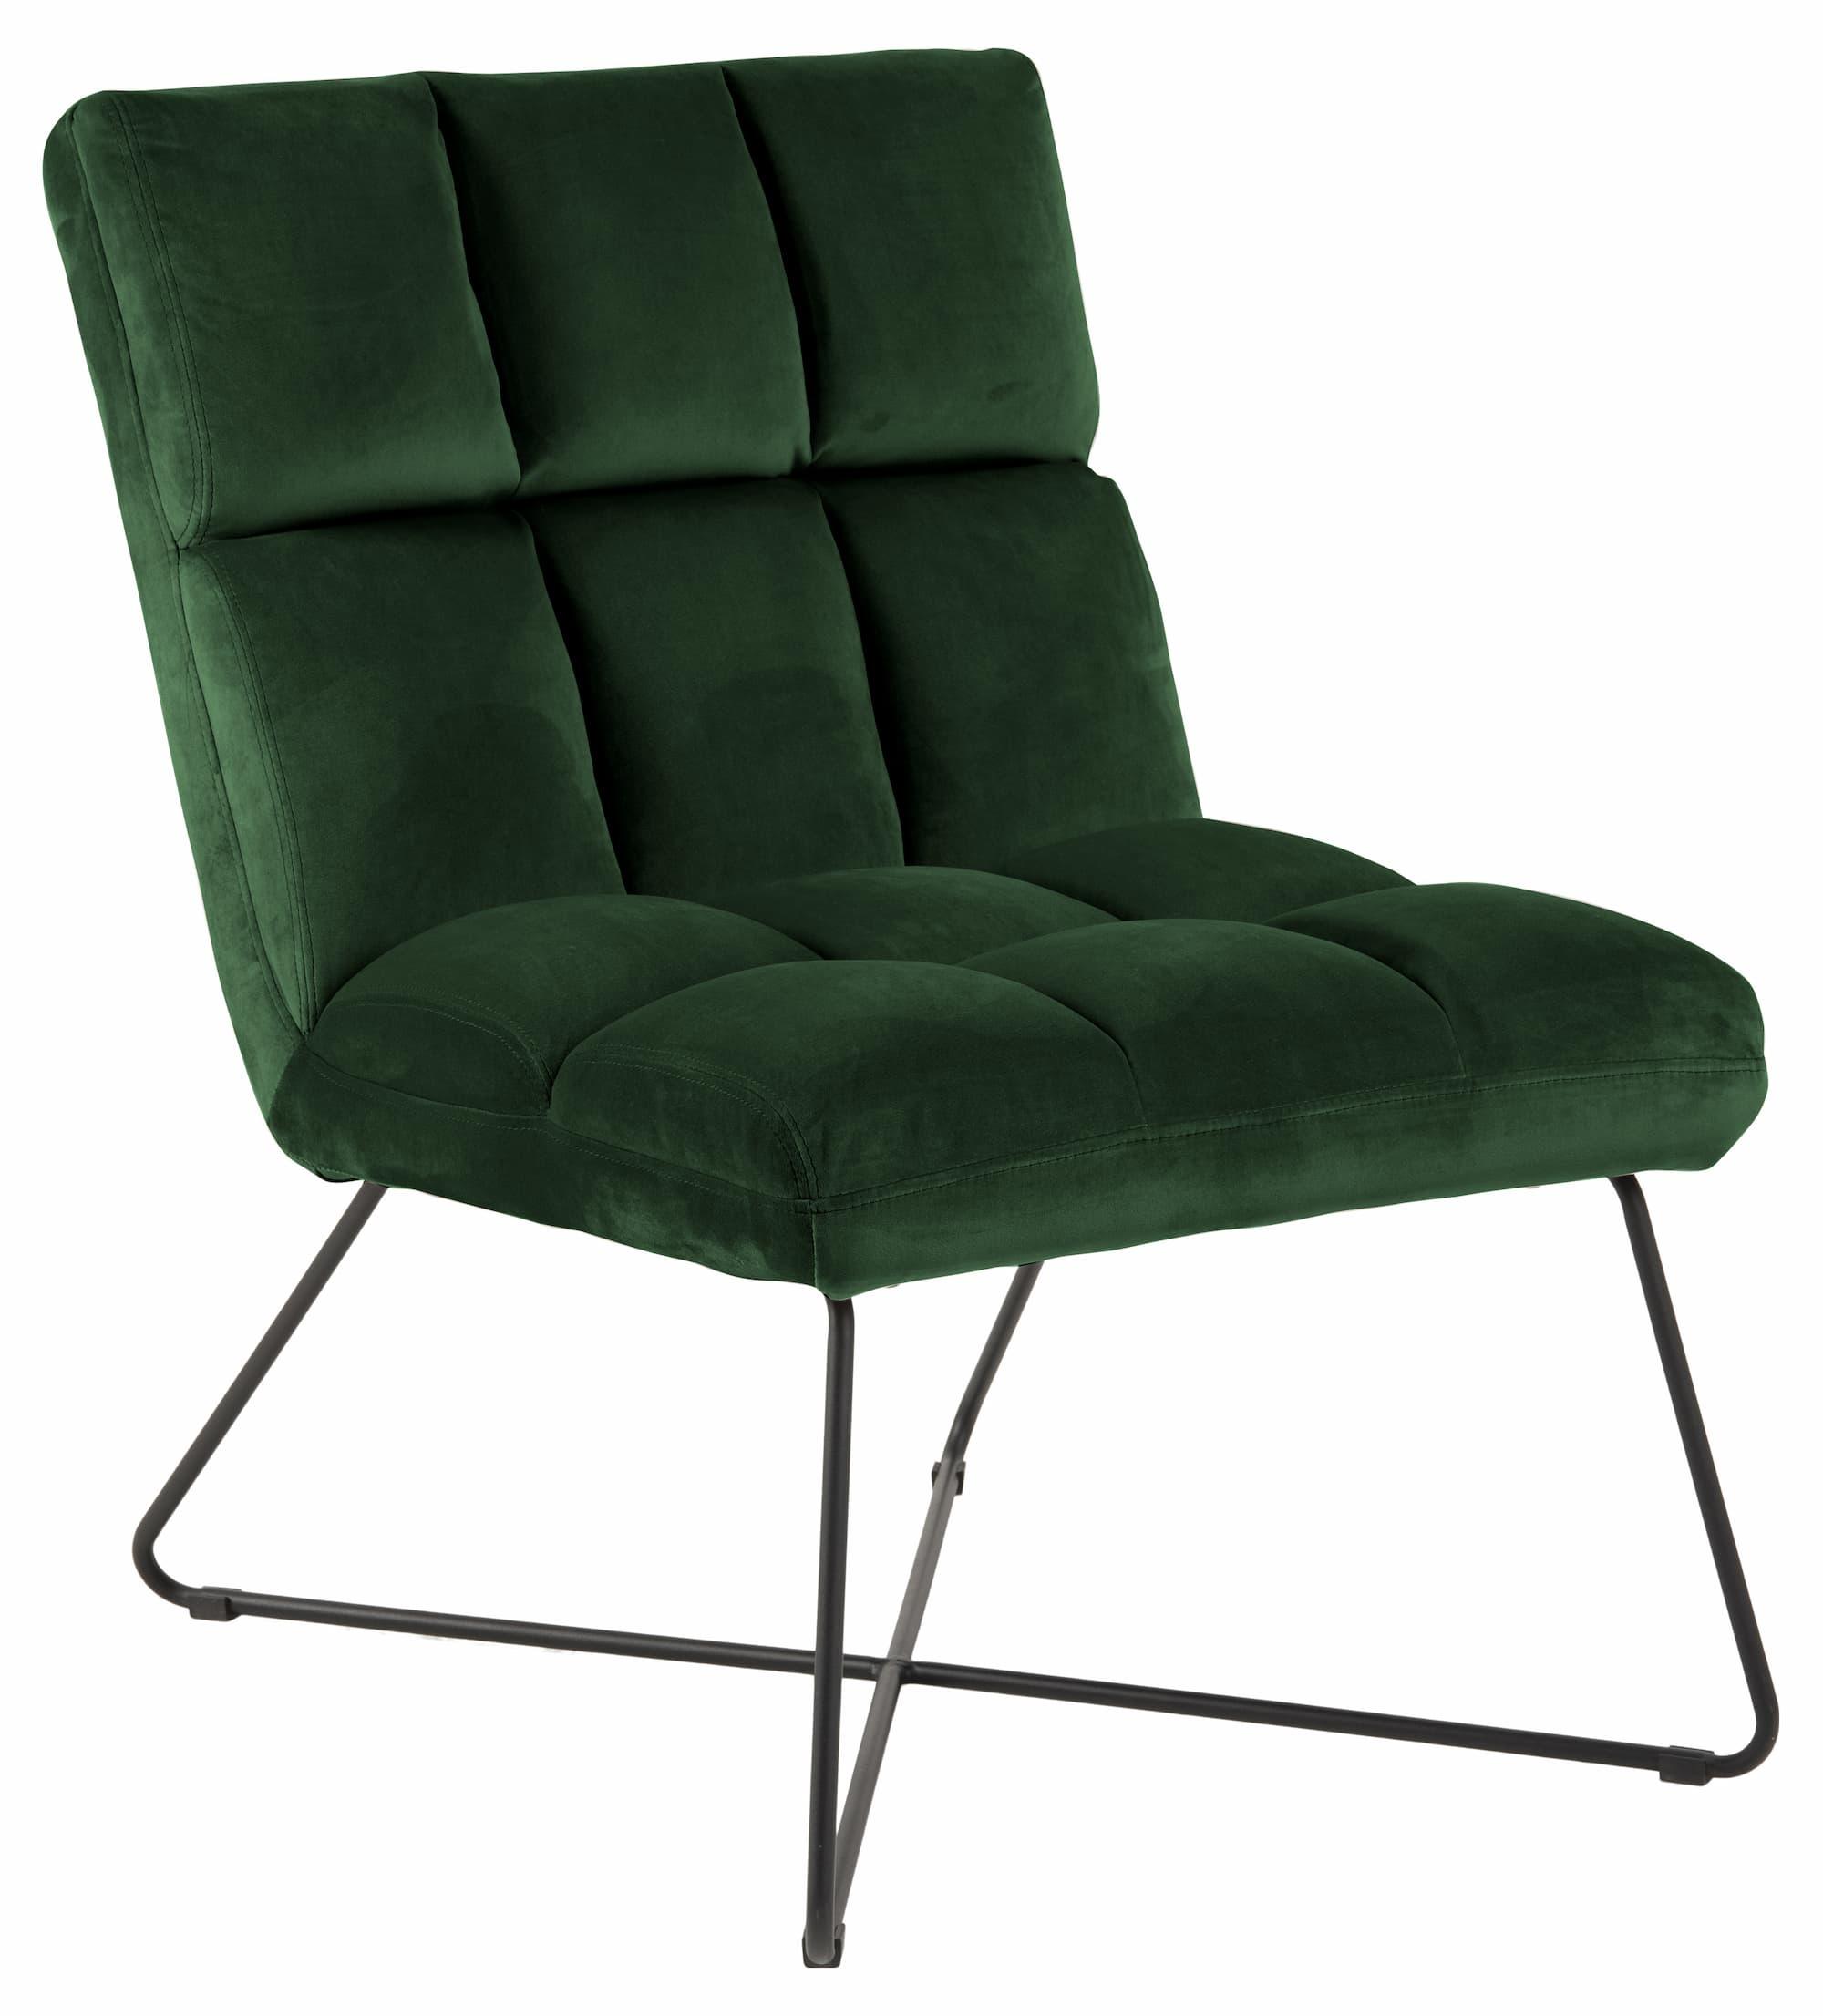 Fotoliu fix tapitat cu stofa si picioare metalice Alba Velvet Verde, l62xA86xH90 cm imagine